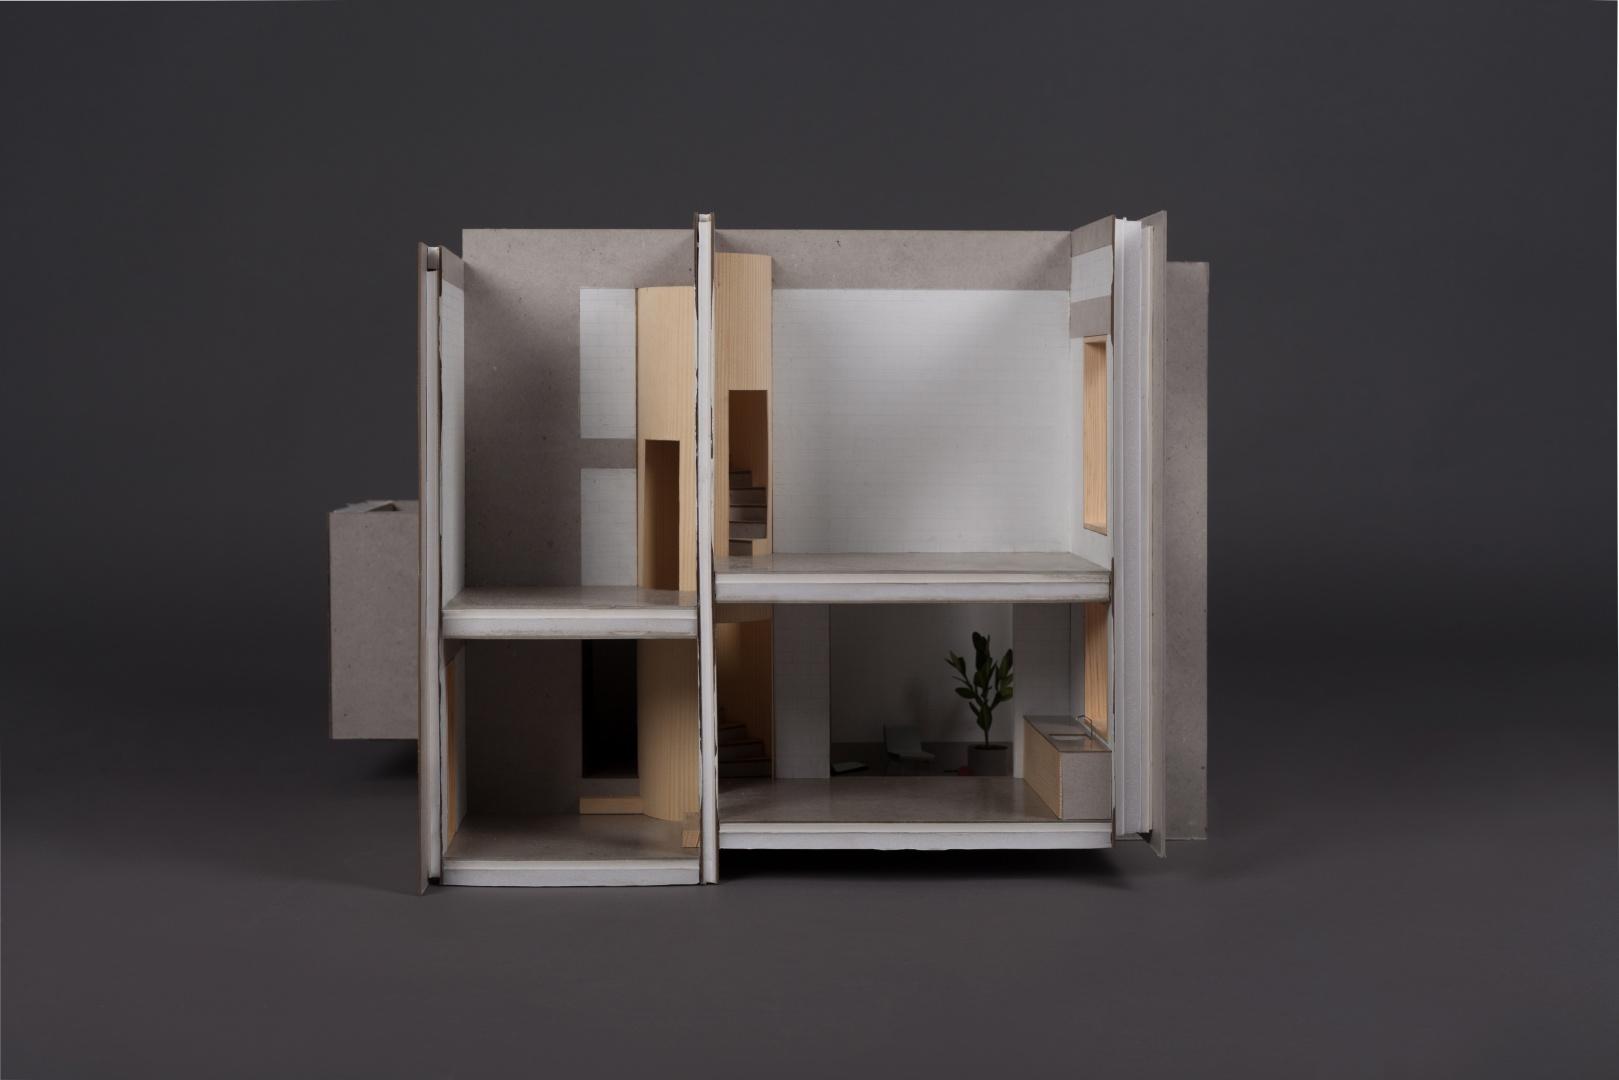 Wohnungsmodell 1:20 © Hamberger Jonas, Theresa Holl